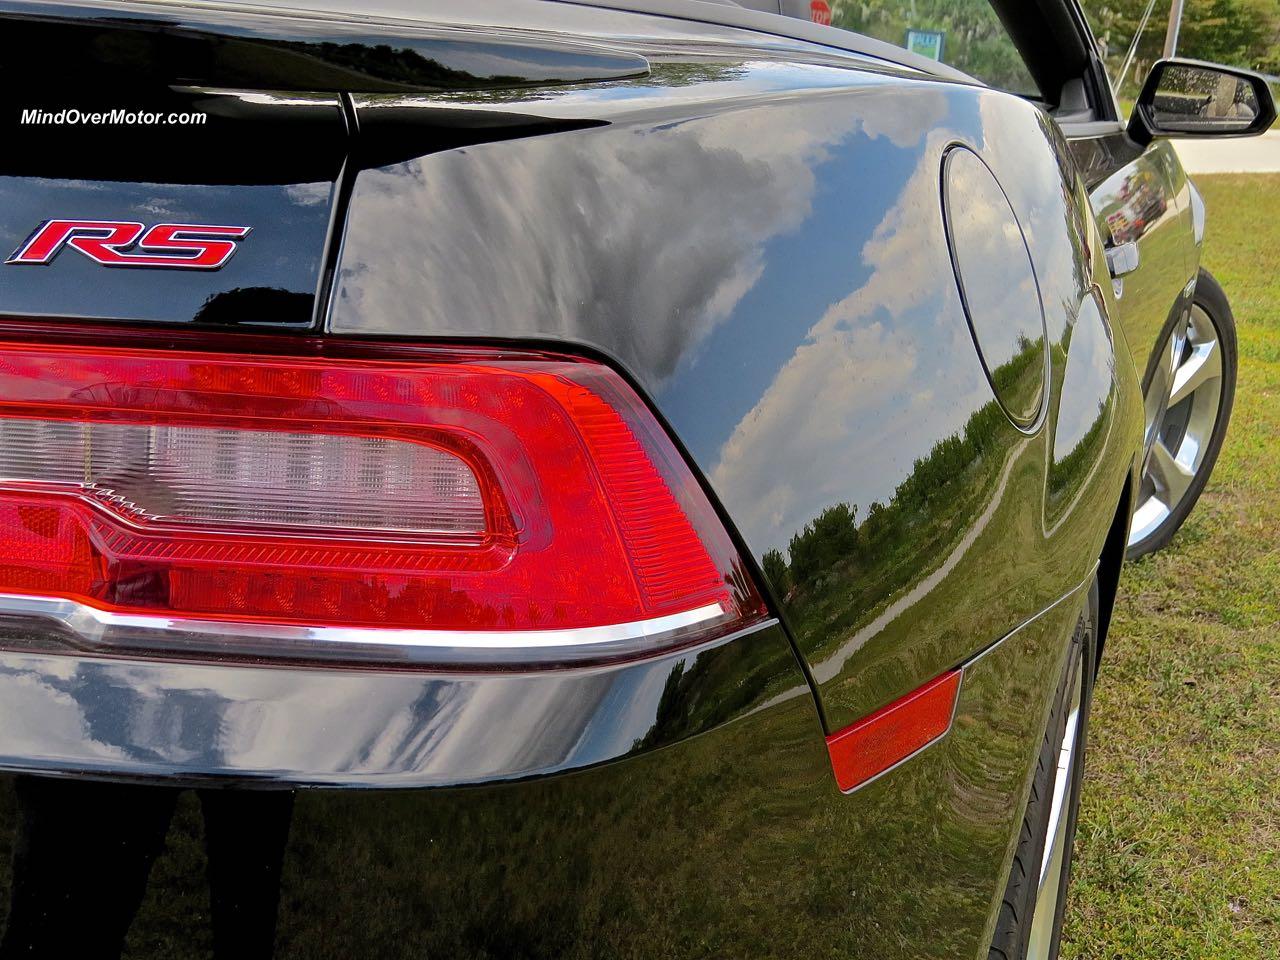 2015 Chevrolet Camaro Convertible Rear Detail